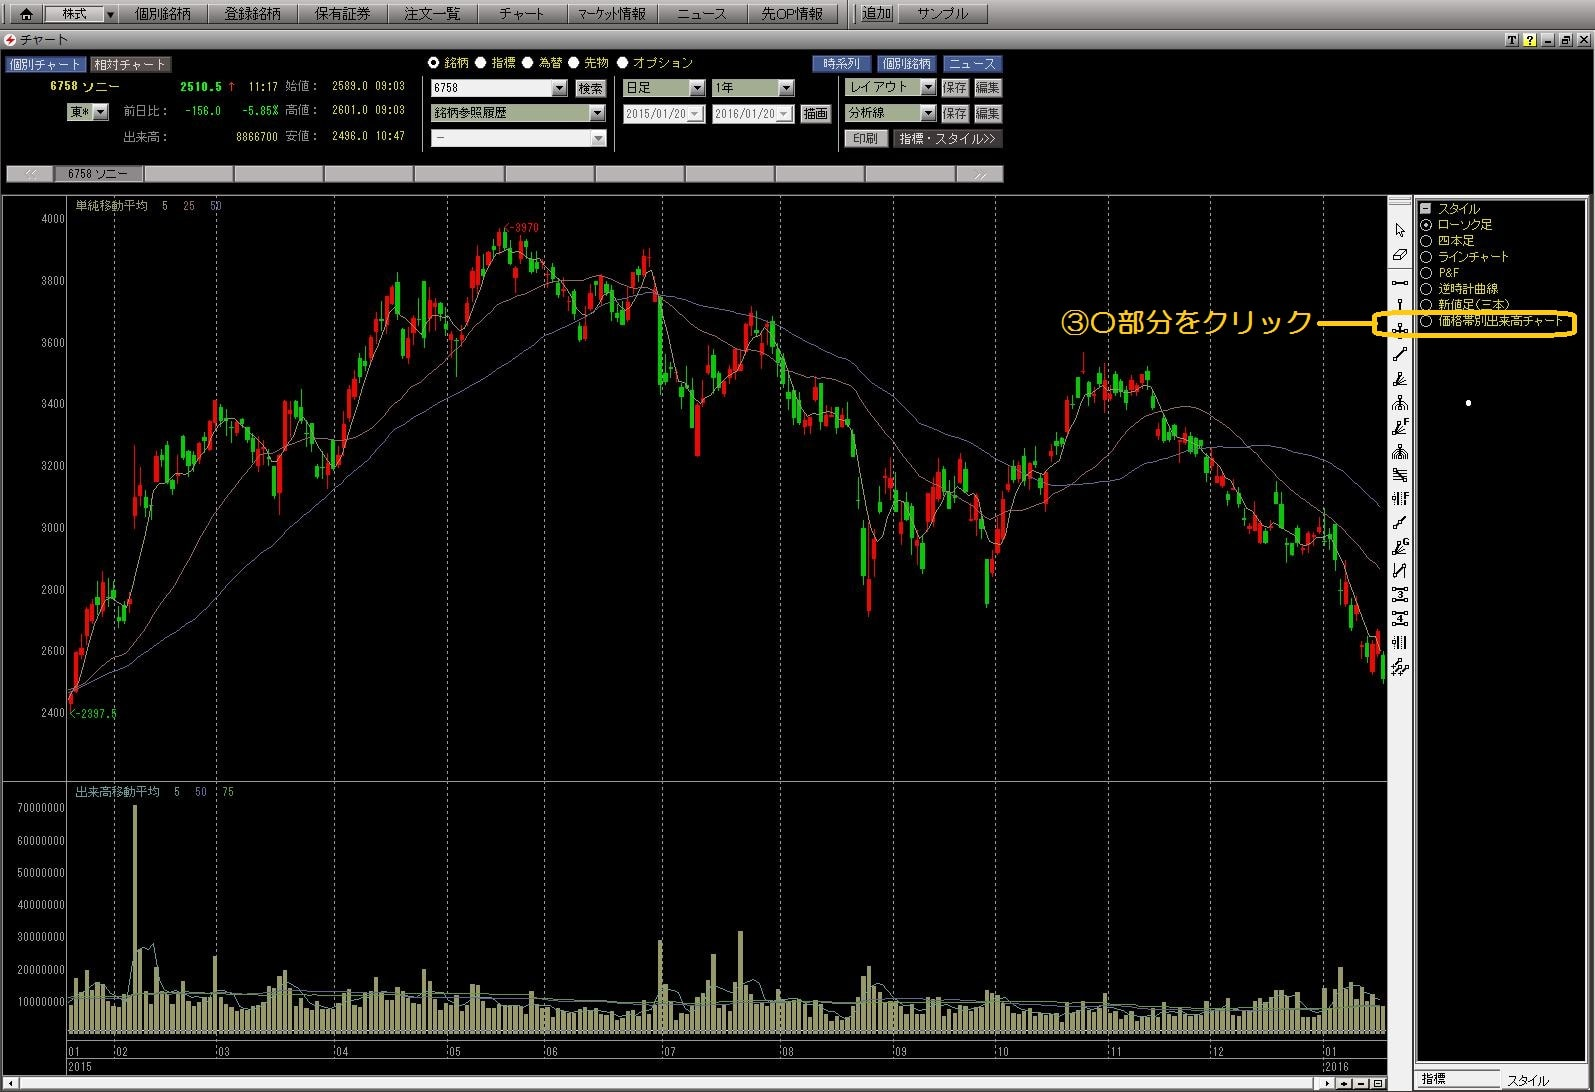 16.1.20SBI証券-価格帯別出来高チャート表示2-min